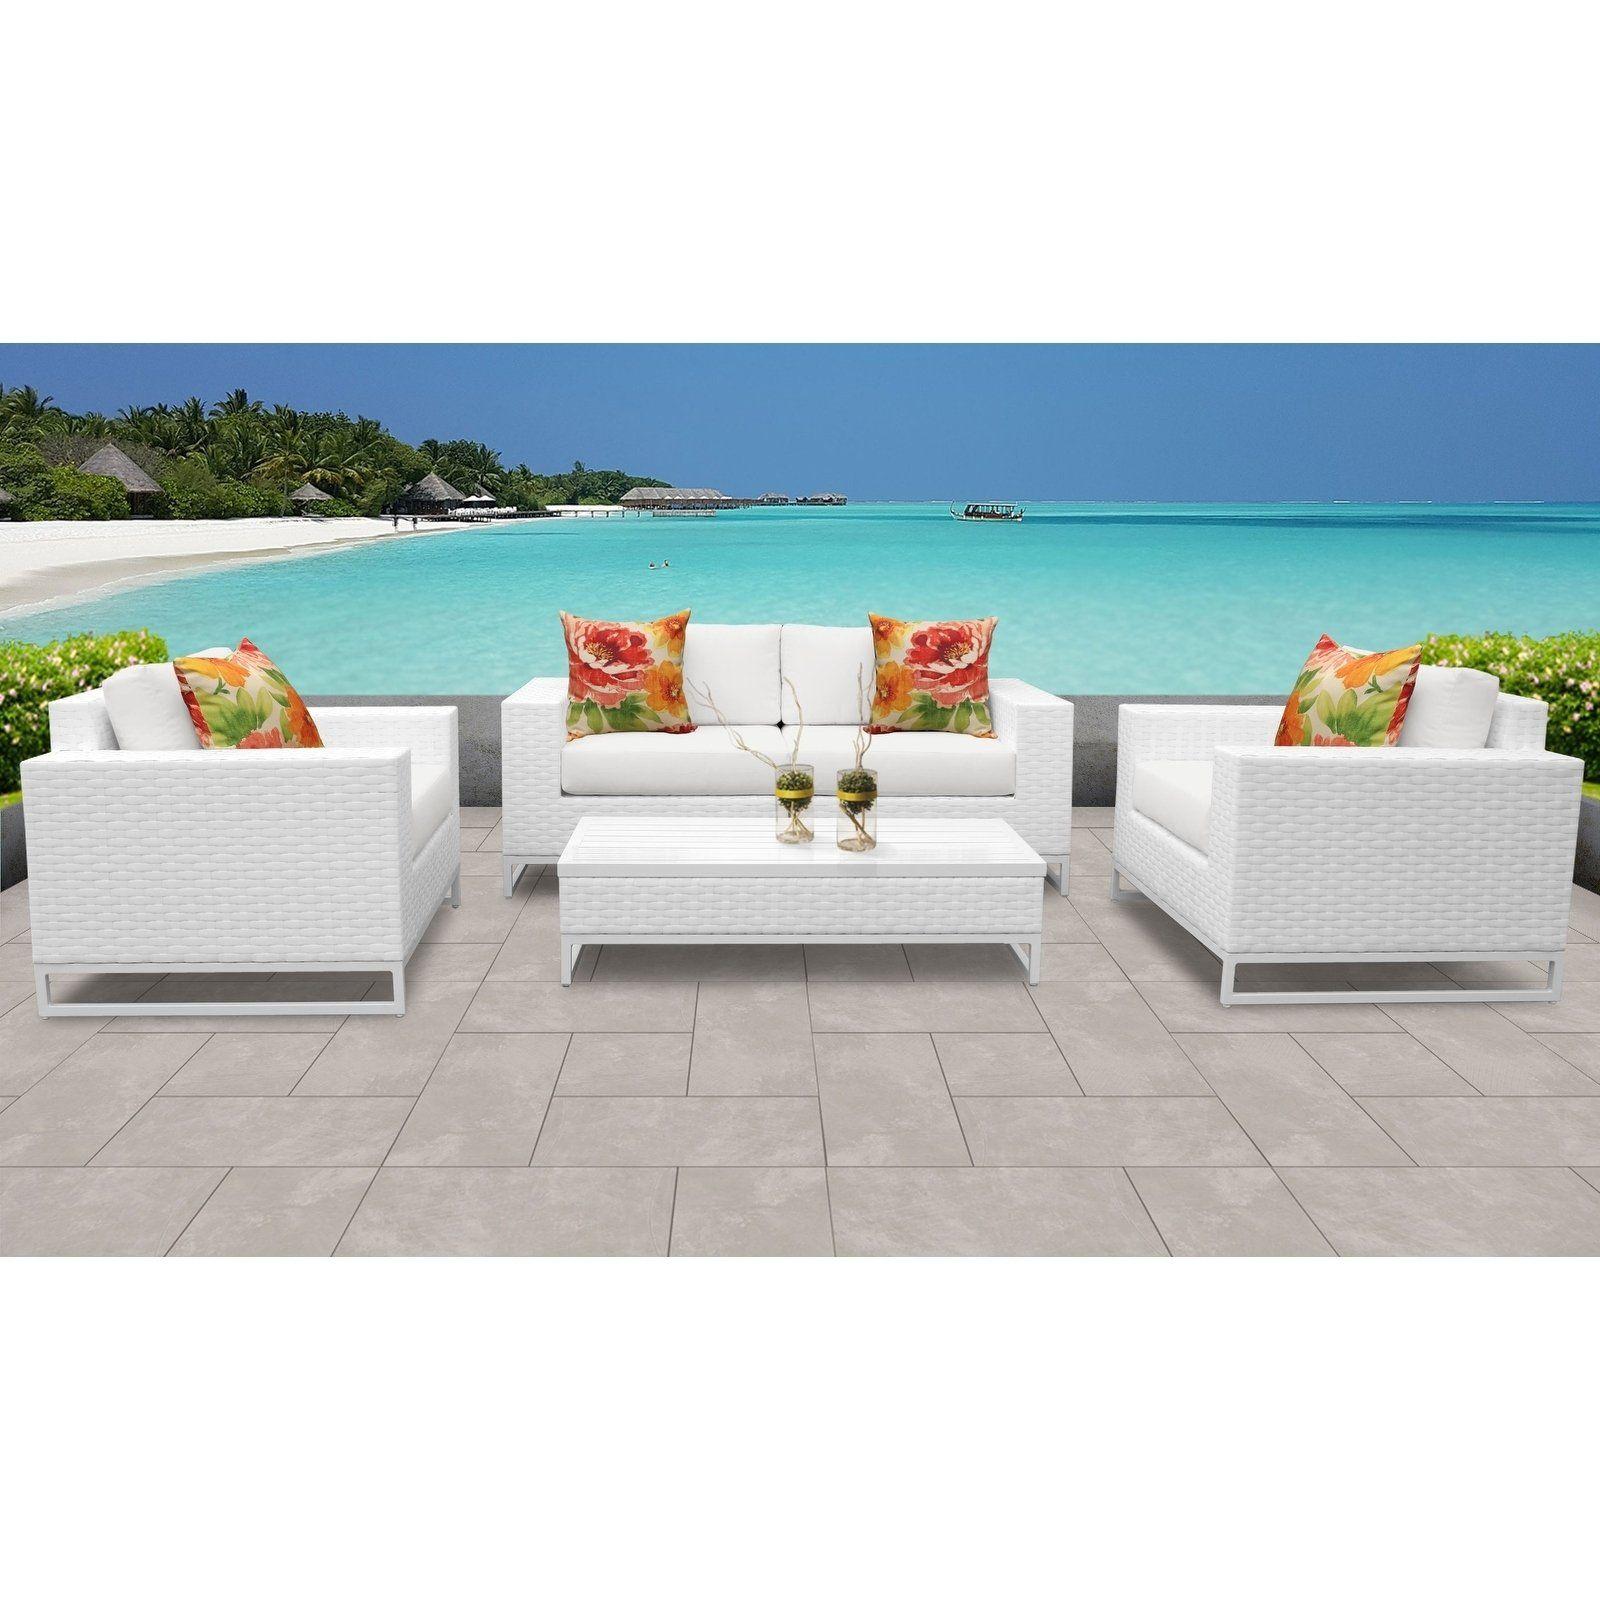 Miami 5 Piece Outdoor Wicker Patio Furniture Set 05f White Tk